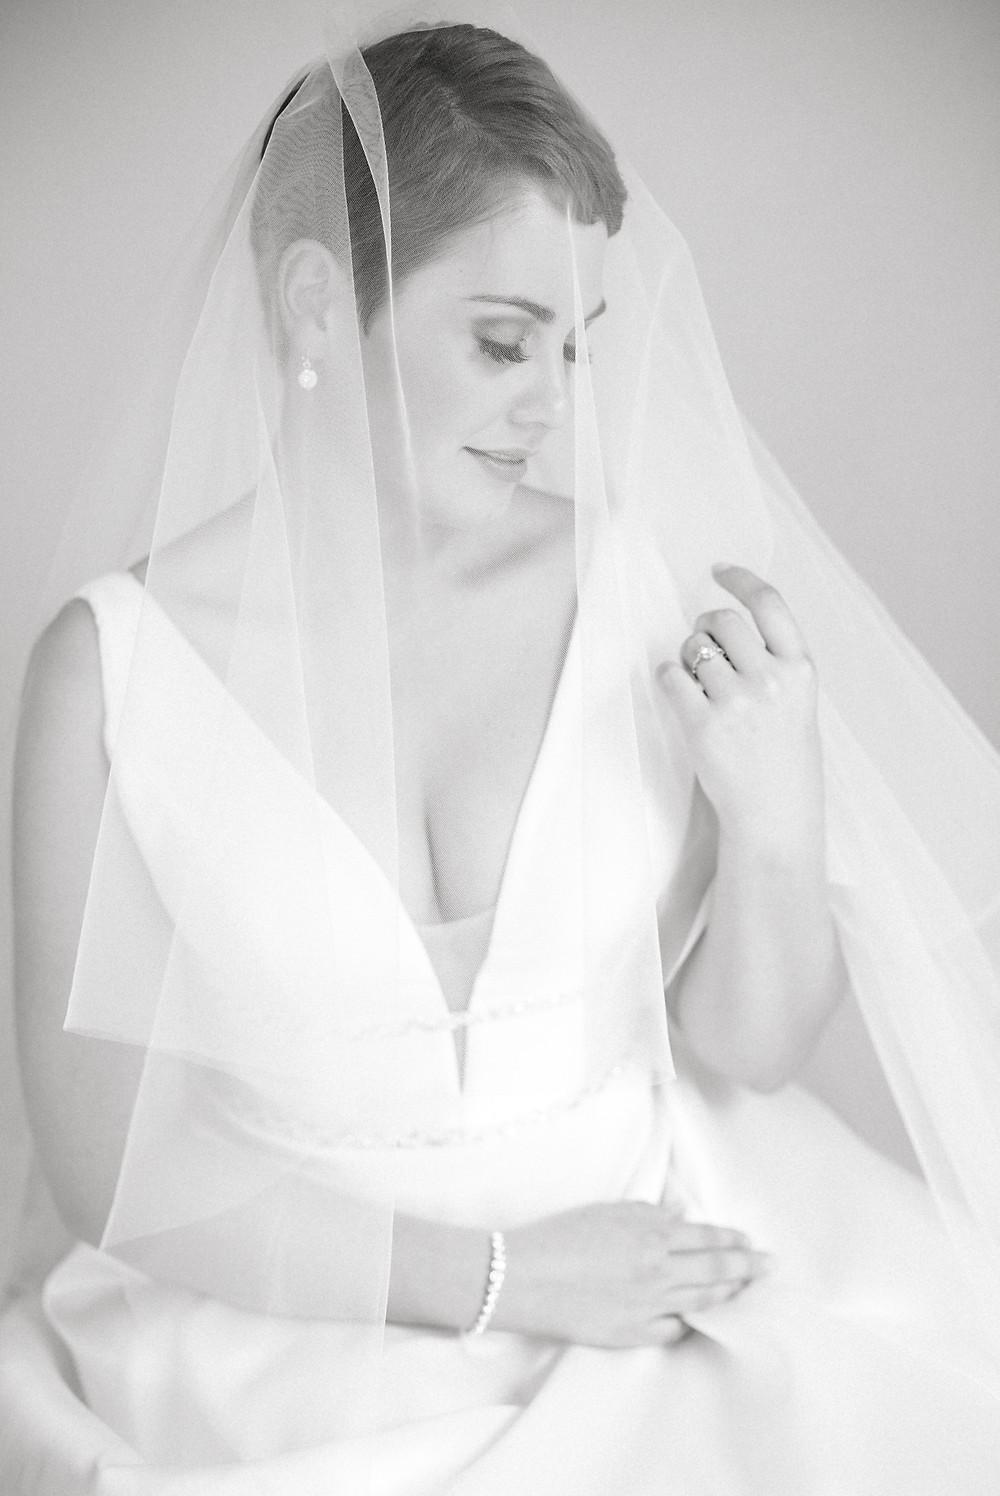 Inimitable, Zavion Kotzé Events Company, Inimitable Wedding Photographer, Inimitable Wedding Photography, Muldersdrift Wedding Photographer, Gauteng Wedding Photographer